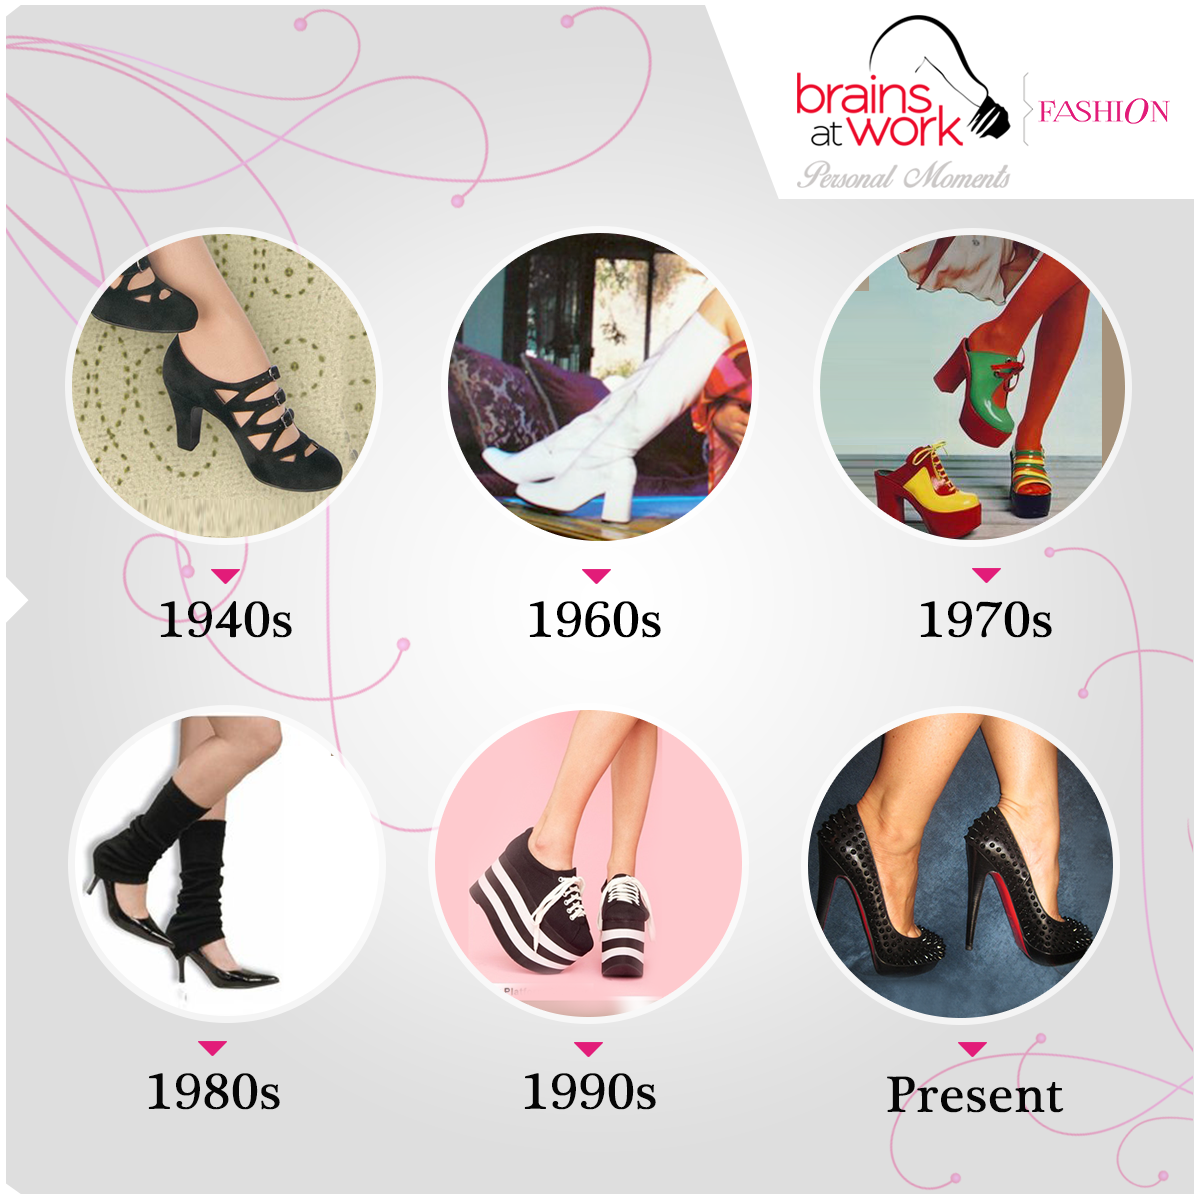 Women's shoes through the decades. #ThrowbackFashion #brainsatwork #Fashion #FashionDubai